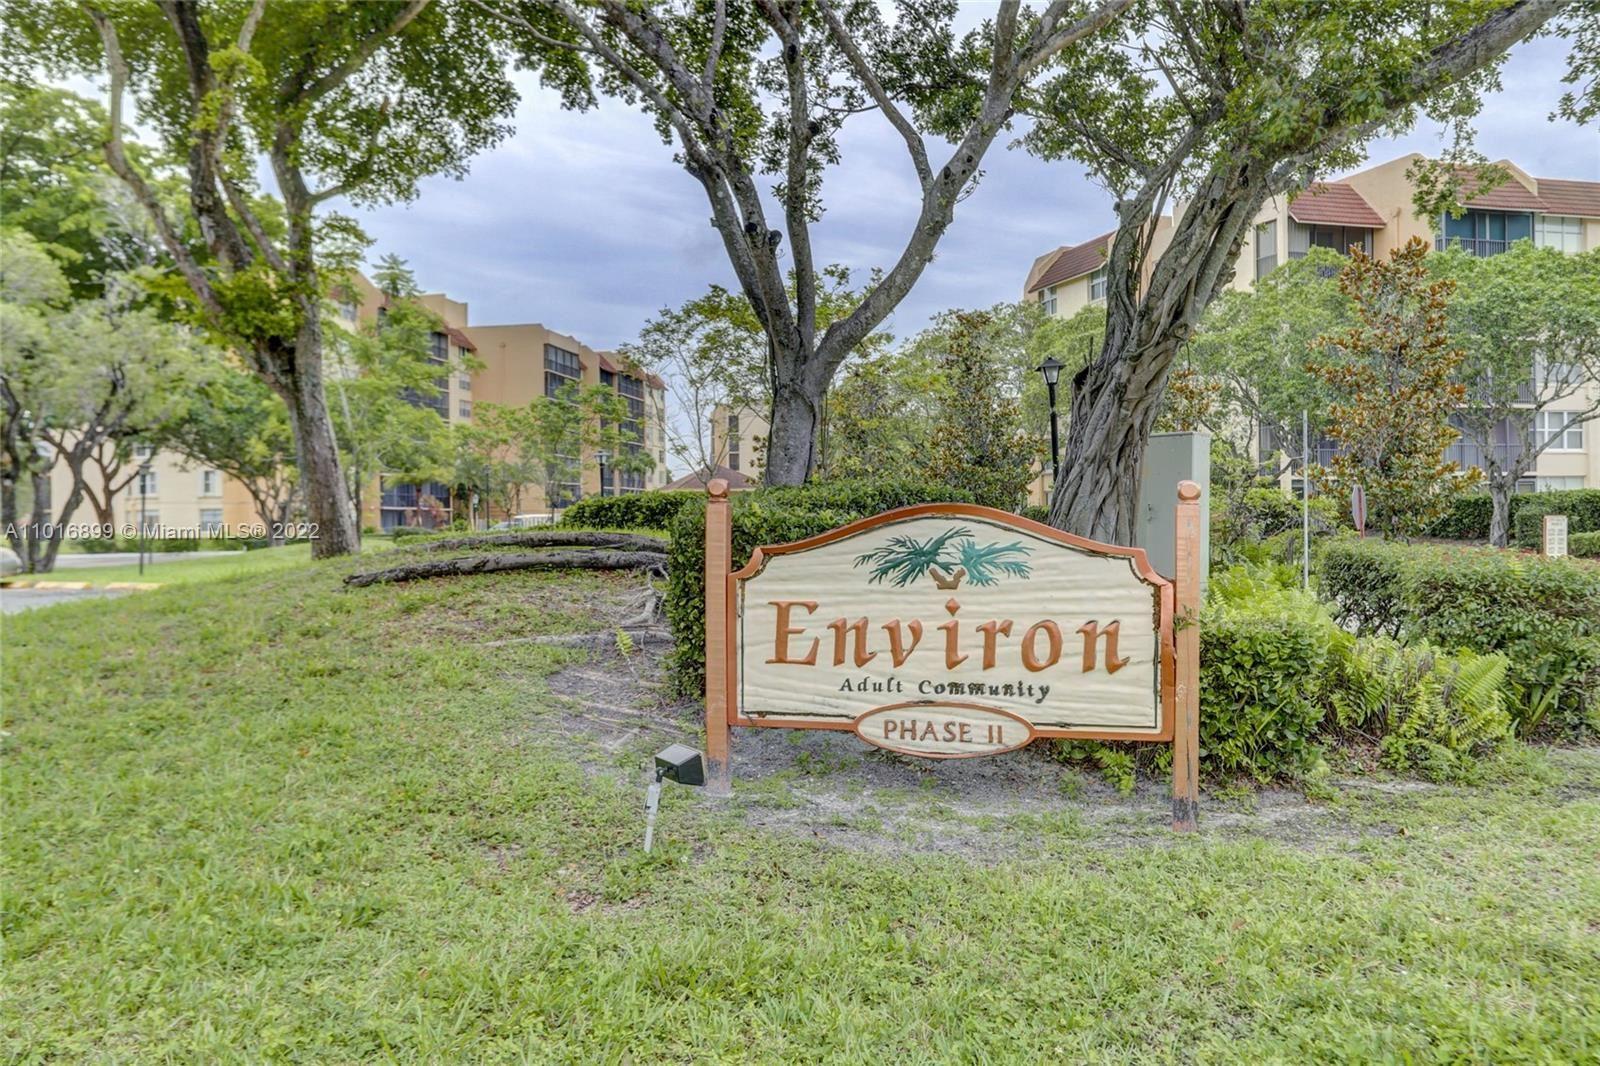 3801 Environ Blvd #117, Lauderhill, FL 33319 - MLS#: A11016899